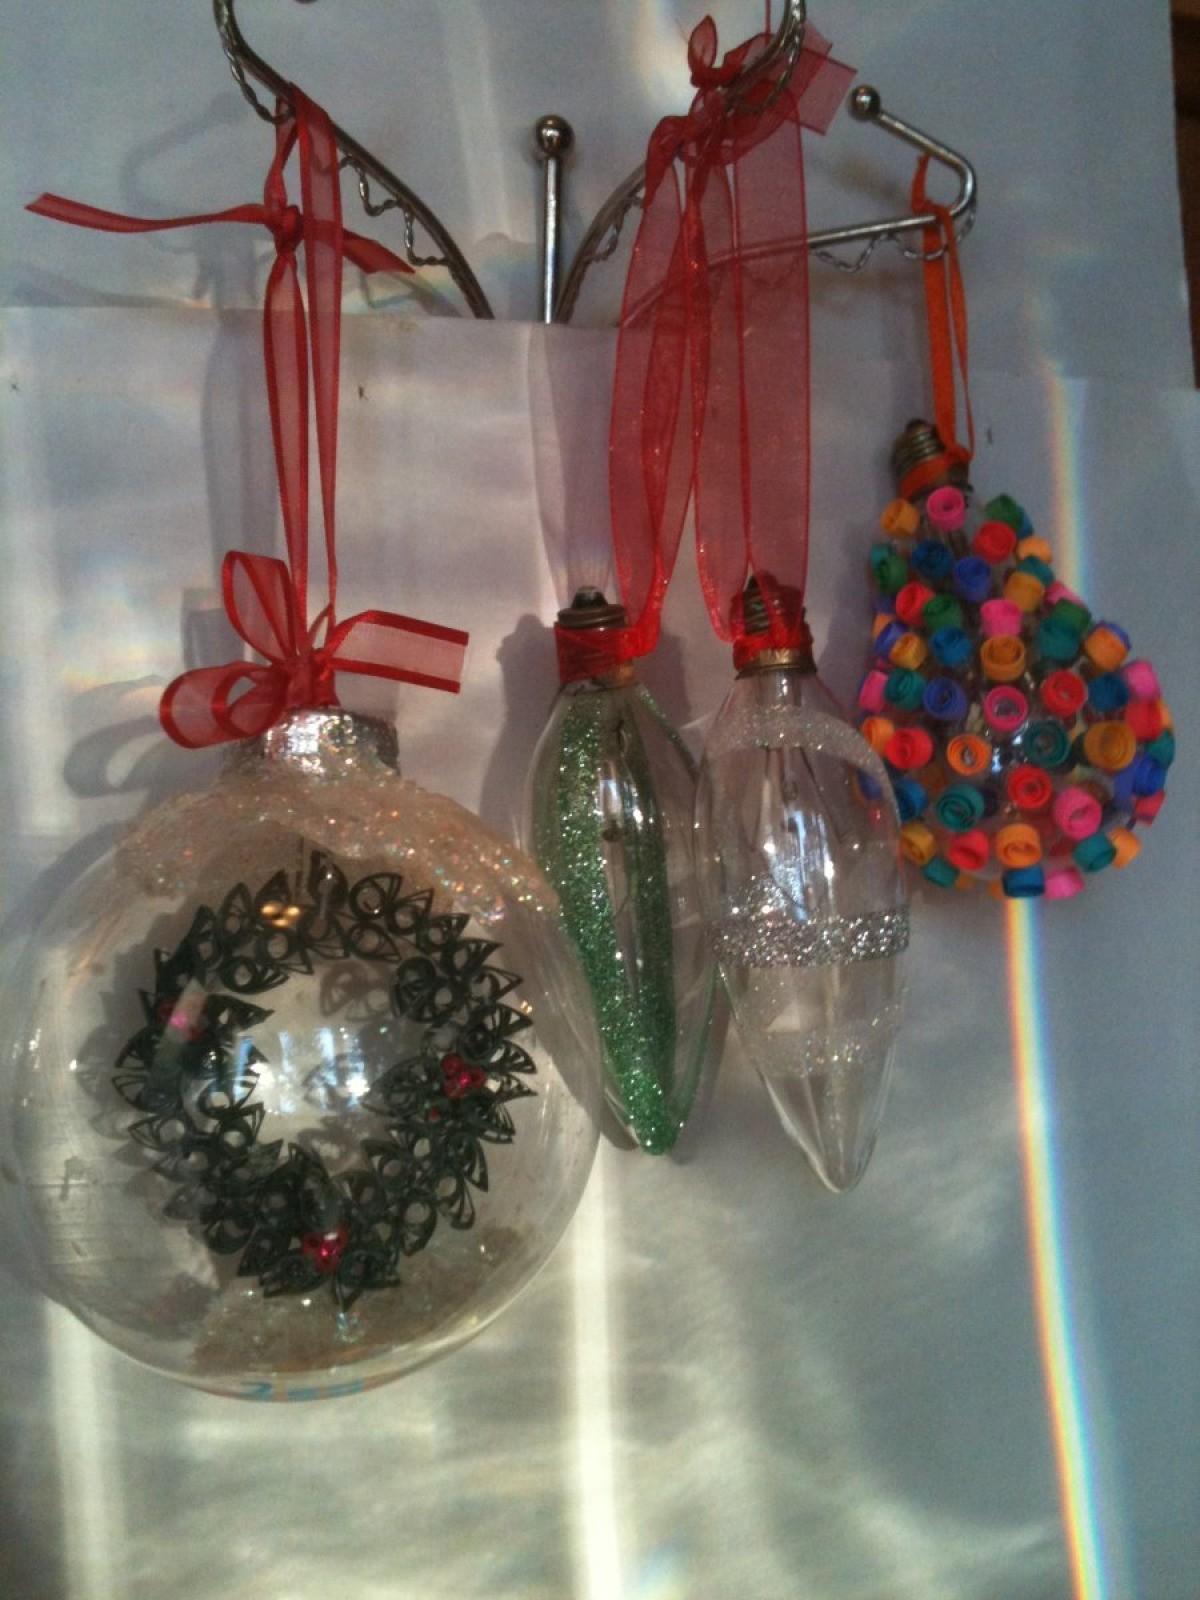 Recycled Light Bulb Christmas Ornaments | ThriftyFun